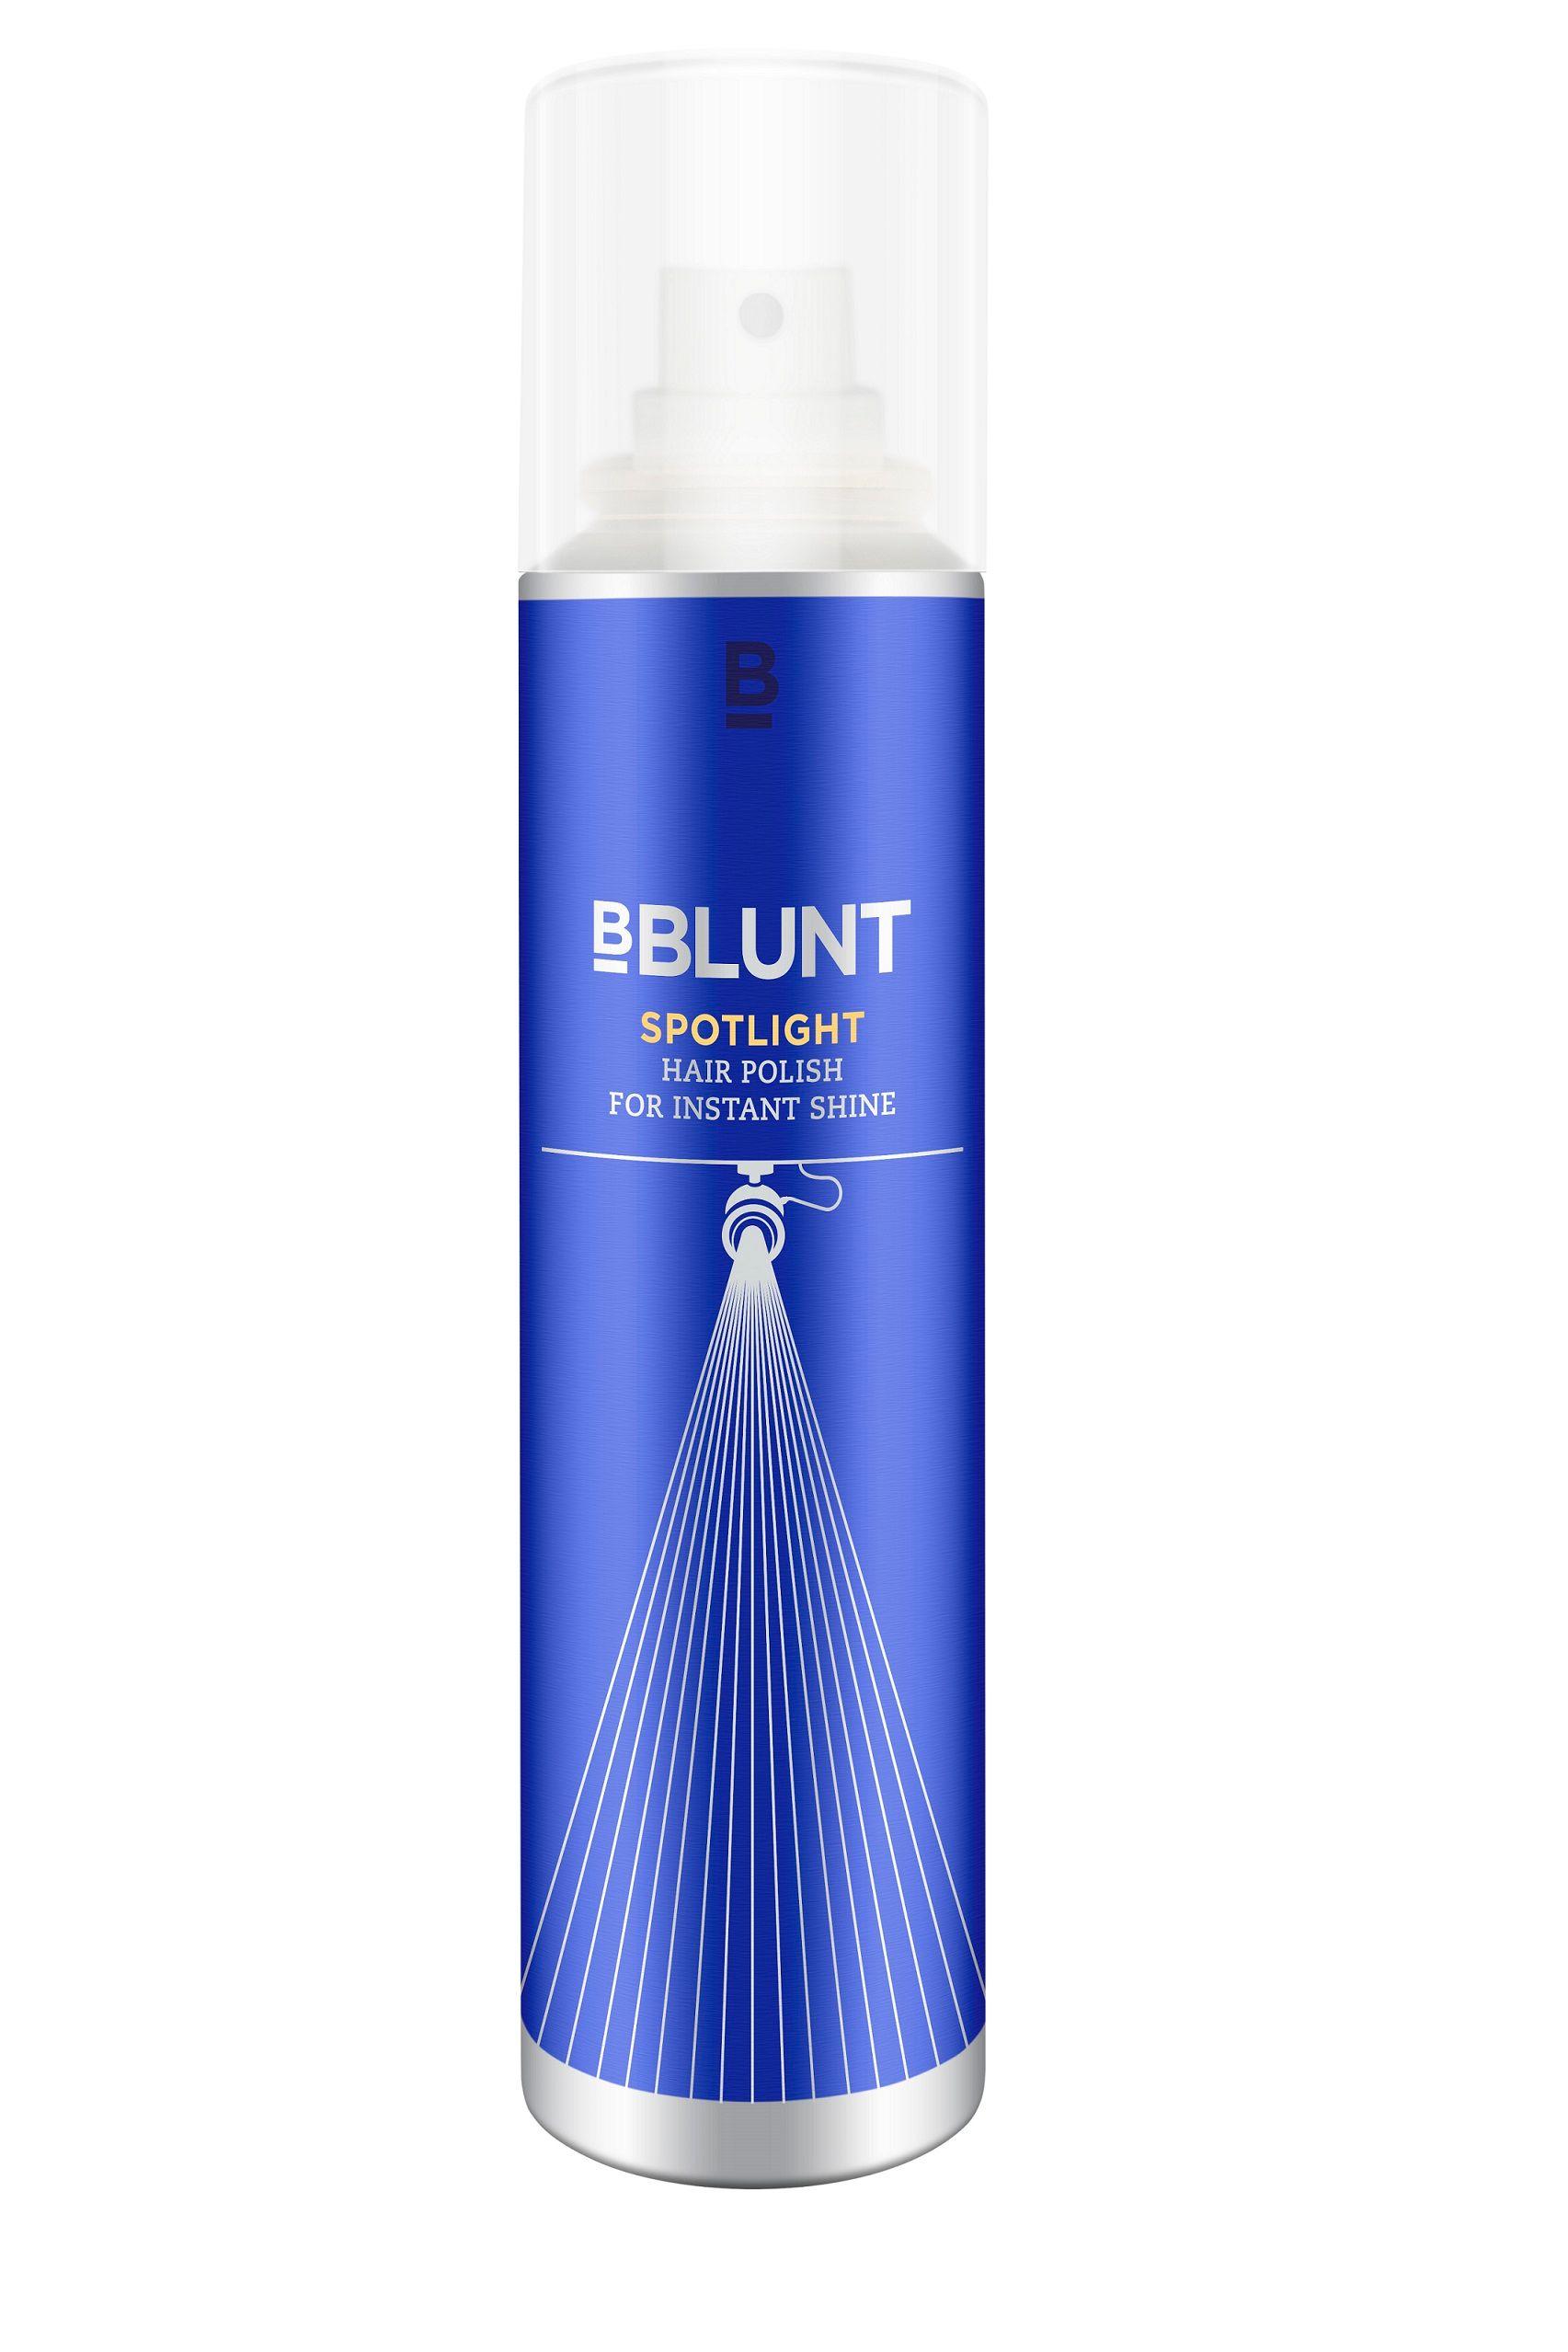 BBLUNT Spotlight Hair Polish, For Instant Shine